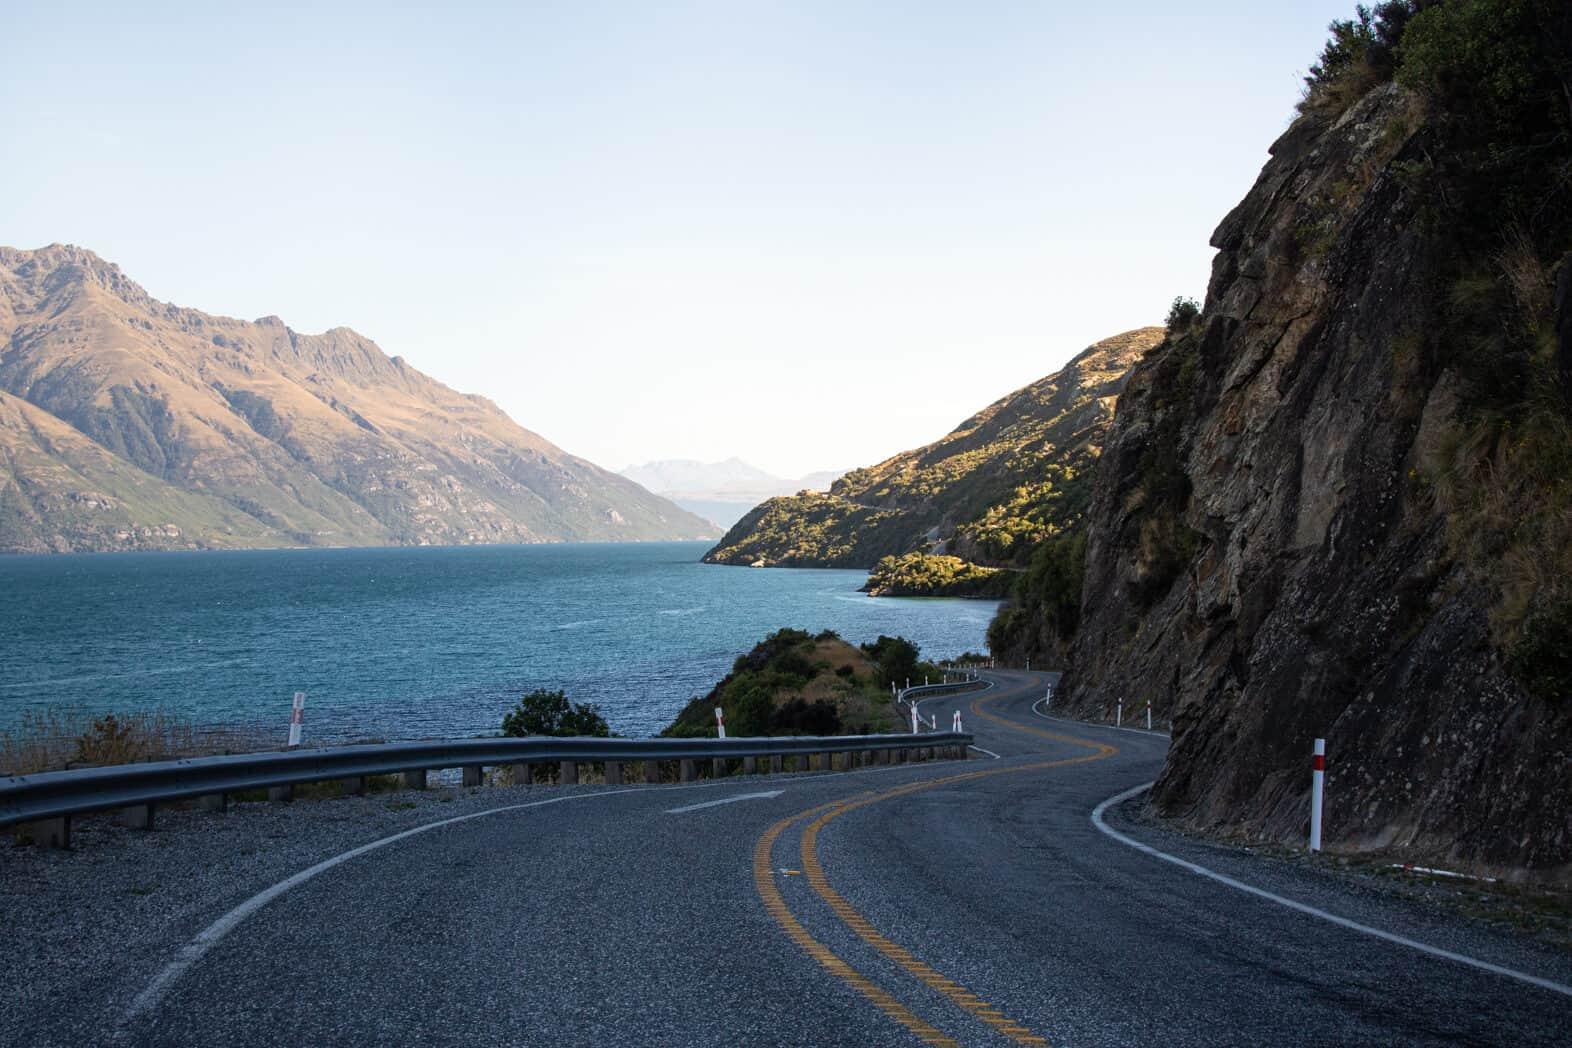 Campervanning New Zealand